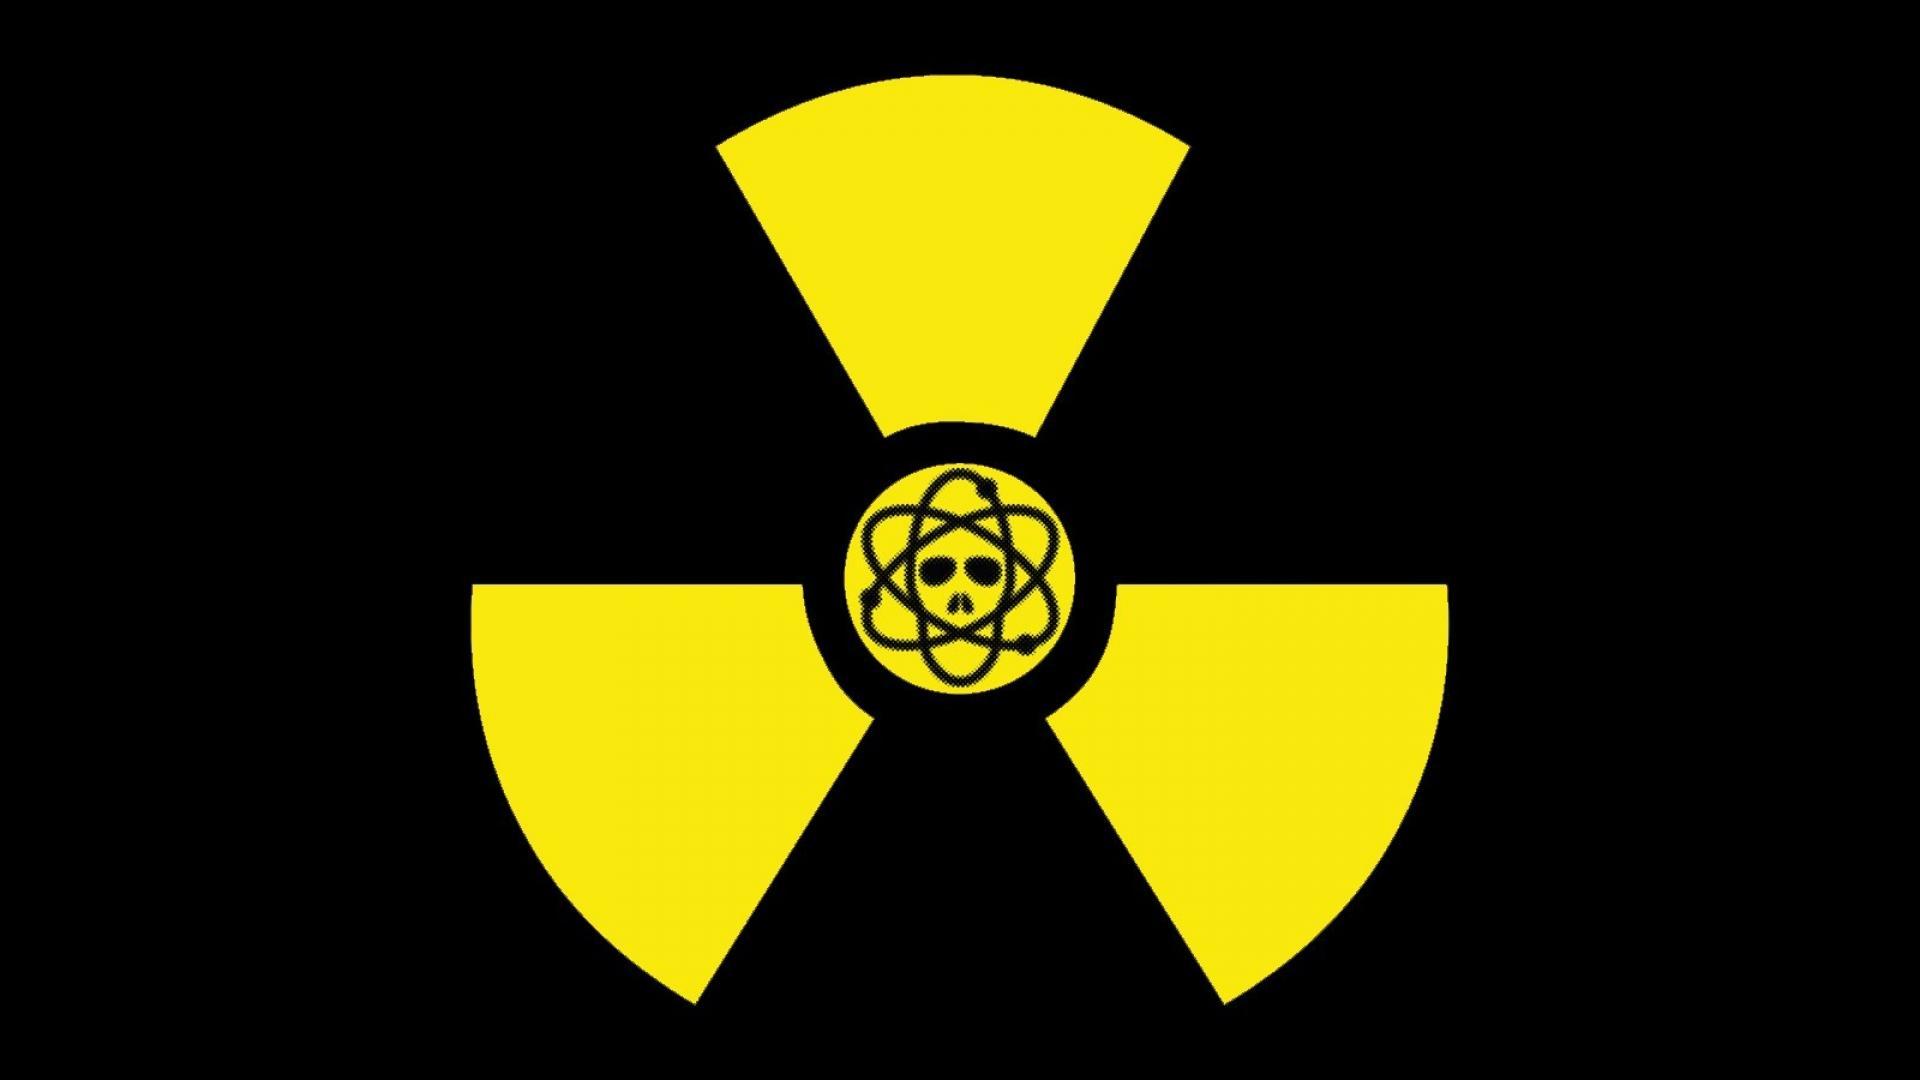 Radioactive Zombie Wallpaper Radiation Wallpaper - ...